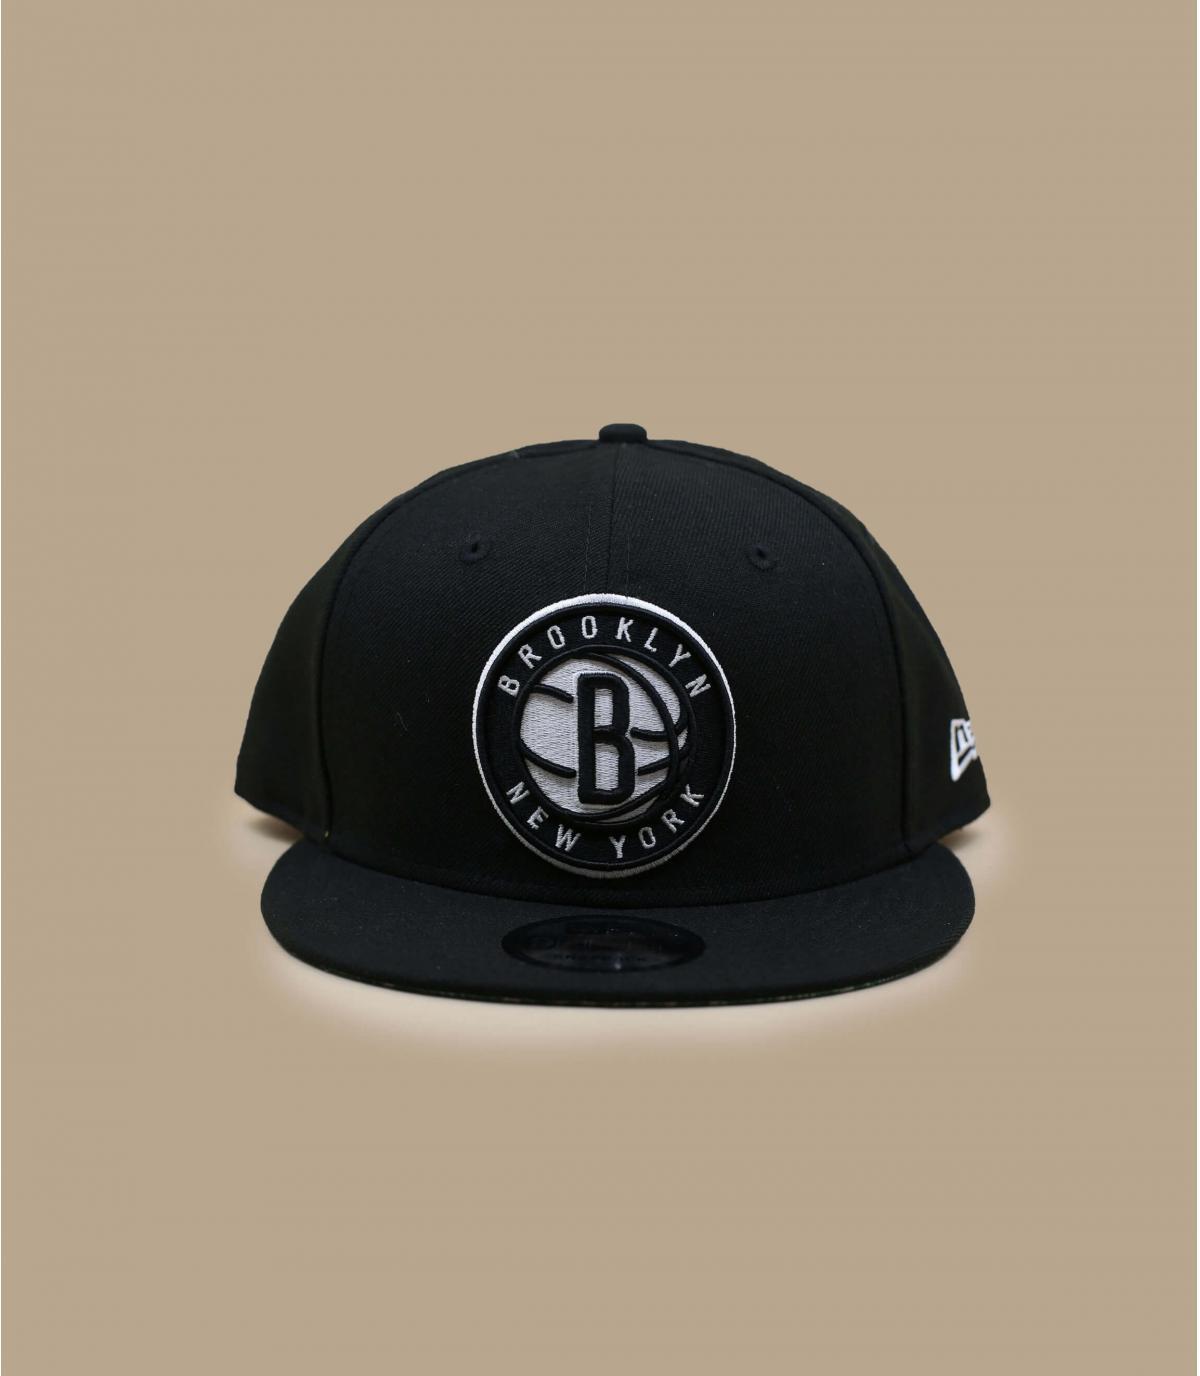 Détails Snapback Quickturn Paisley Brooklyn Nets 950 - image 2